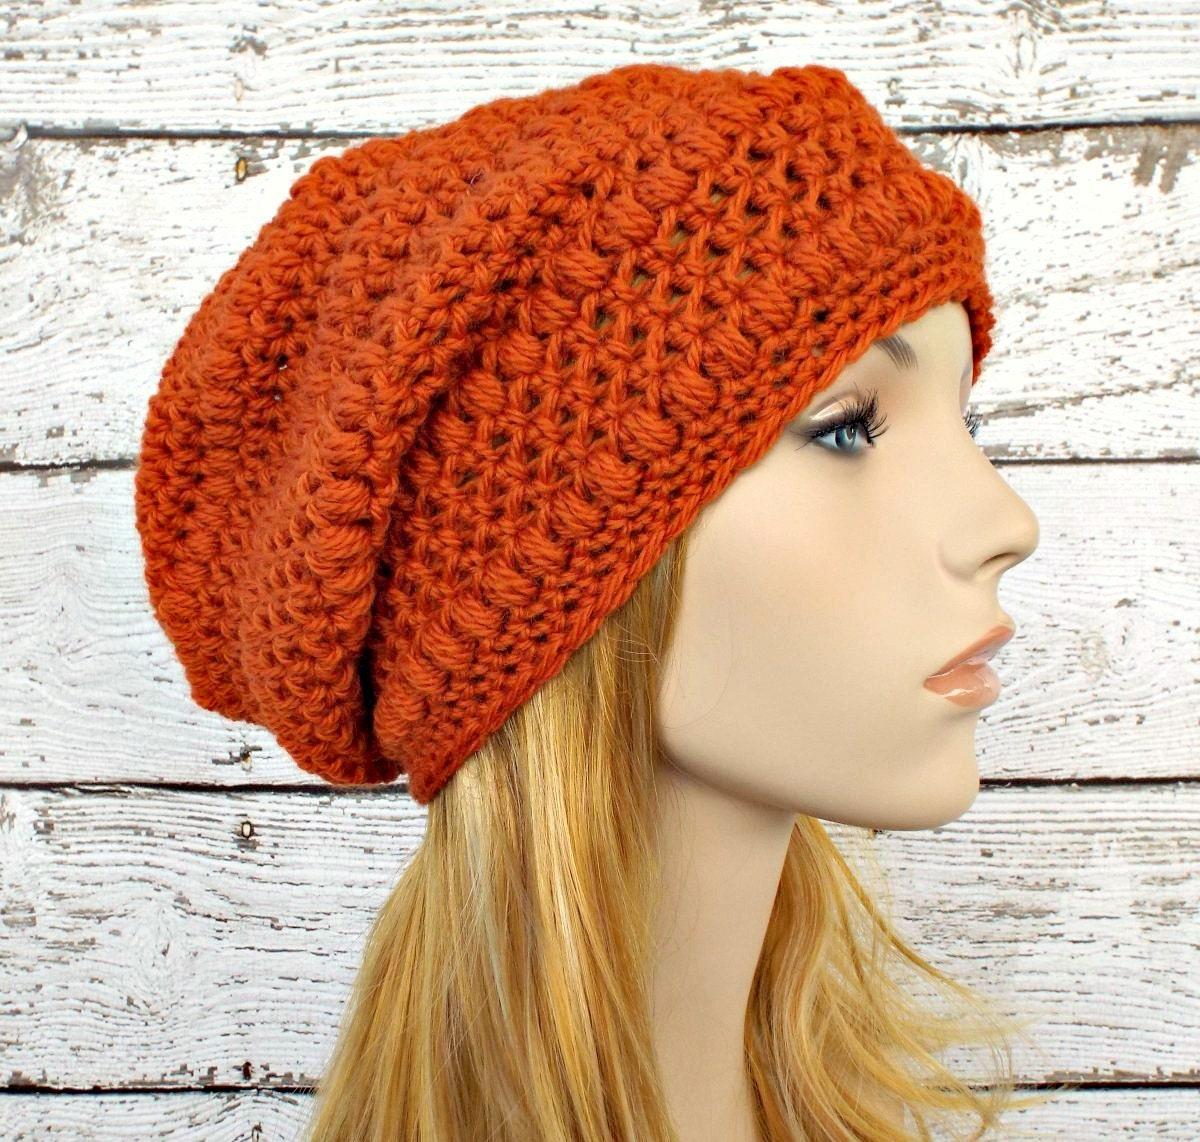 b2ca68a51a1 Orange Womens Hat - Penelope Puff Stitch Slouchy Beanie Pumpkin Orange  Crochet Hat - Orange Hat Womens Accessories Fall Fashion Winter Hat